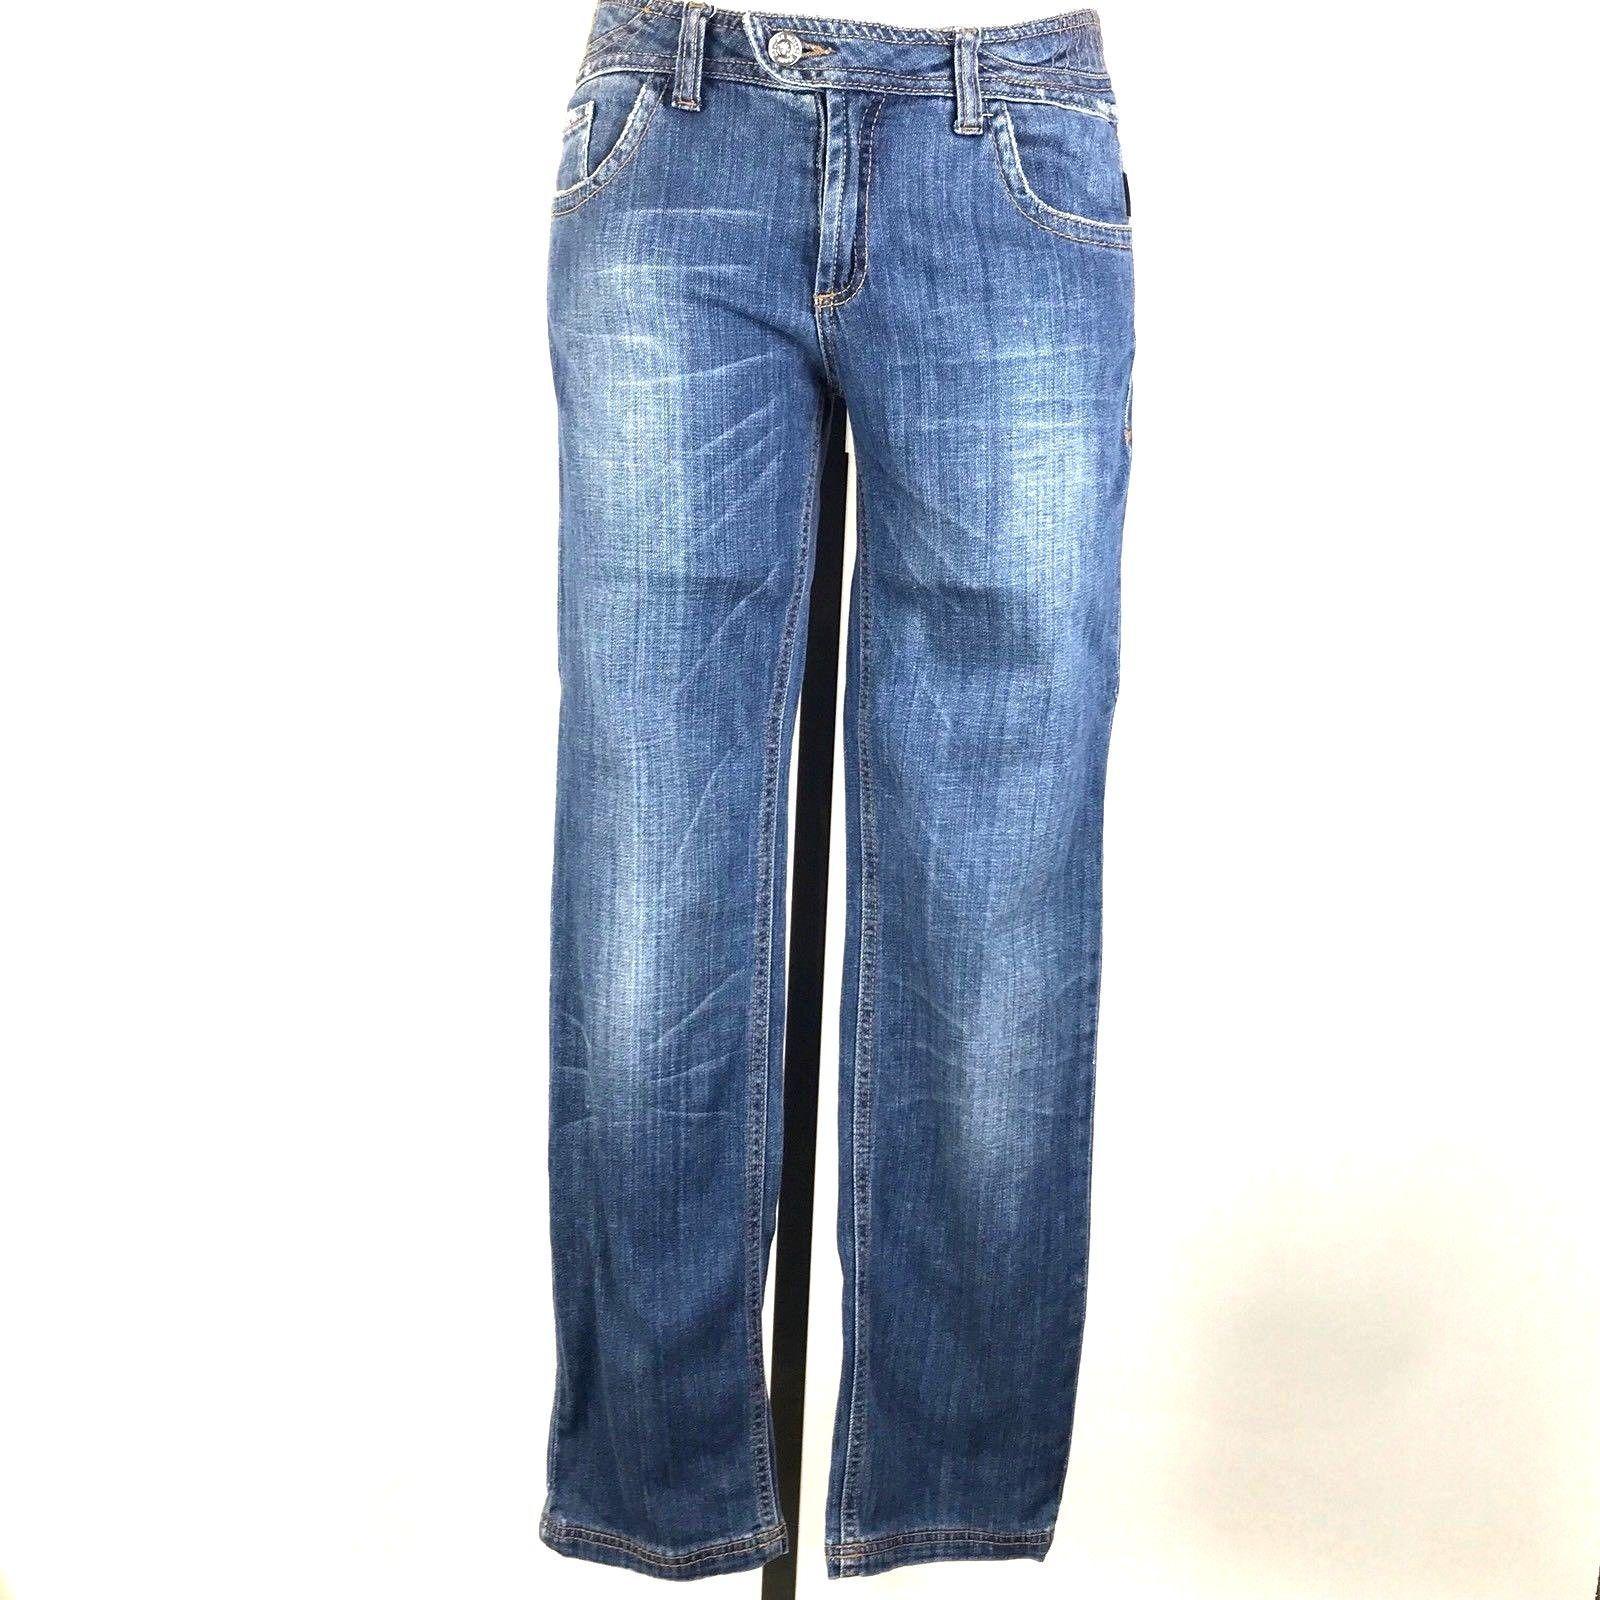 Missy Stretch denim ripped Skinny capri jeans indigo wash free ship WG-619//26291